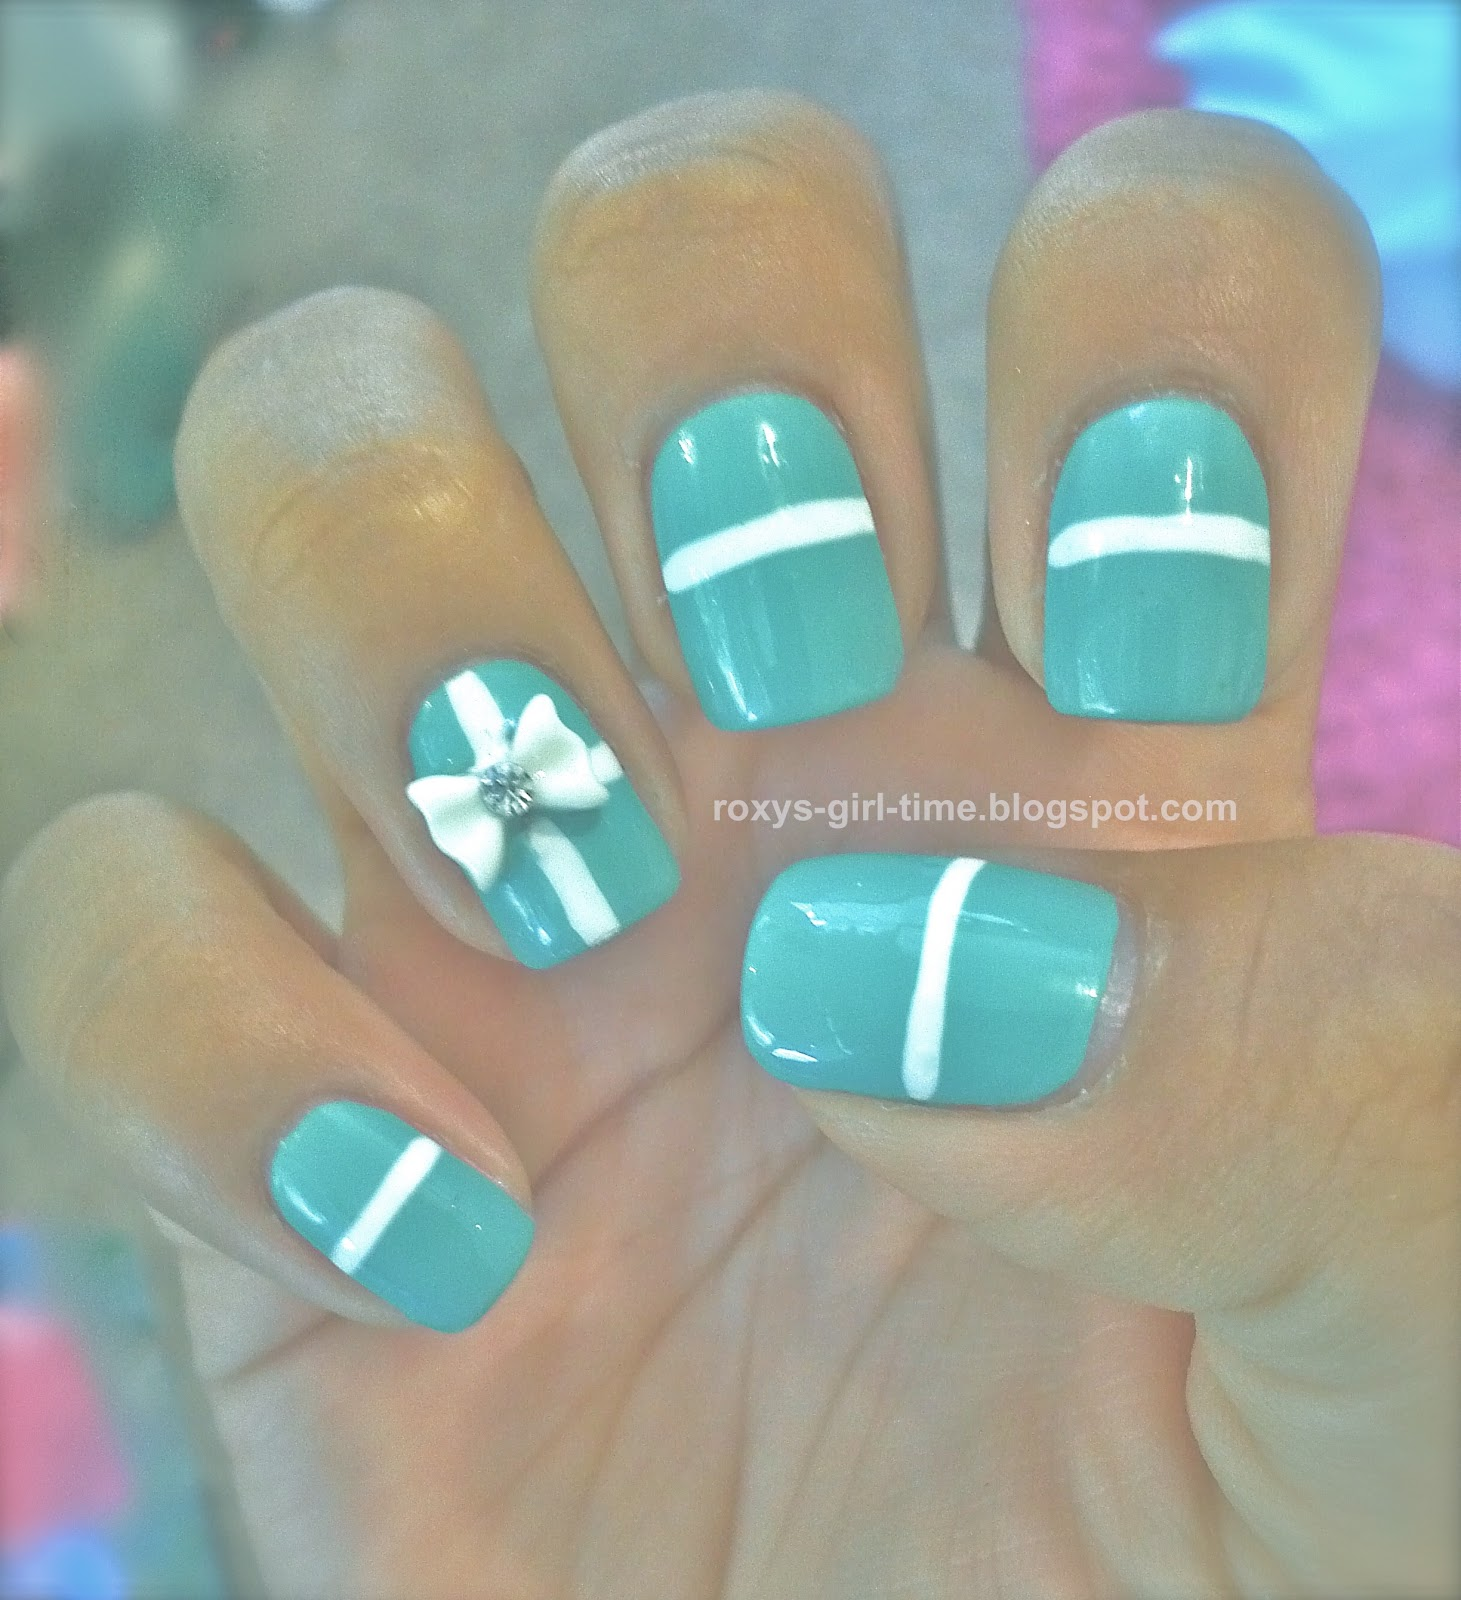 Tiffany Blue Nail Art: Roxy's Girl Time: NOTD: Tiffany Manicure